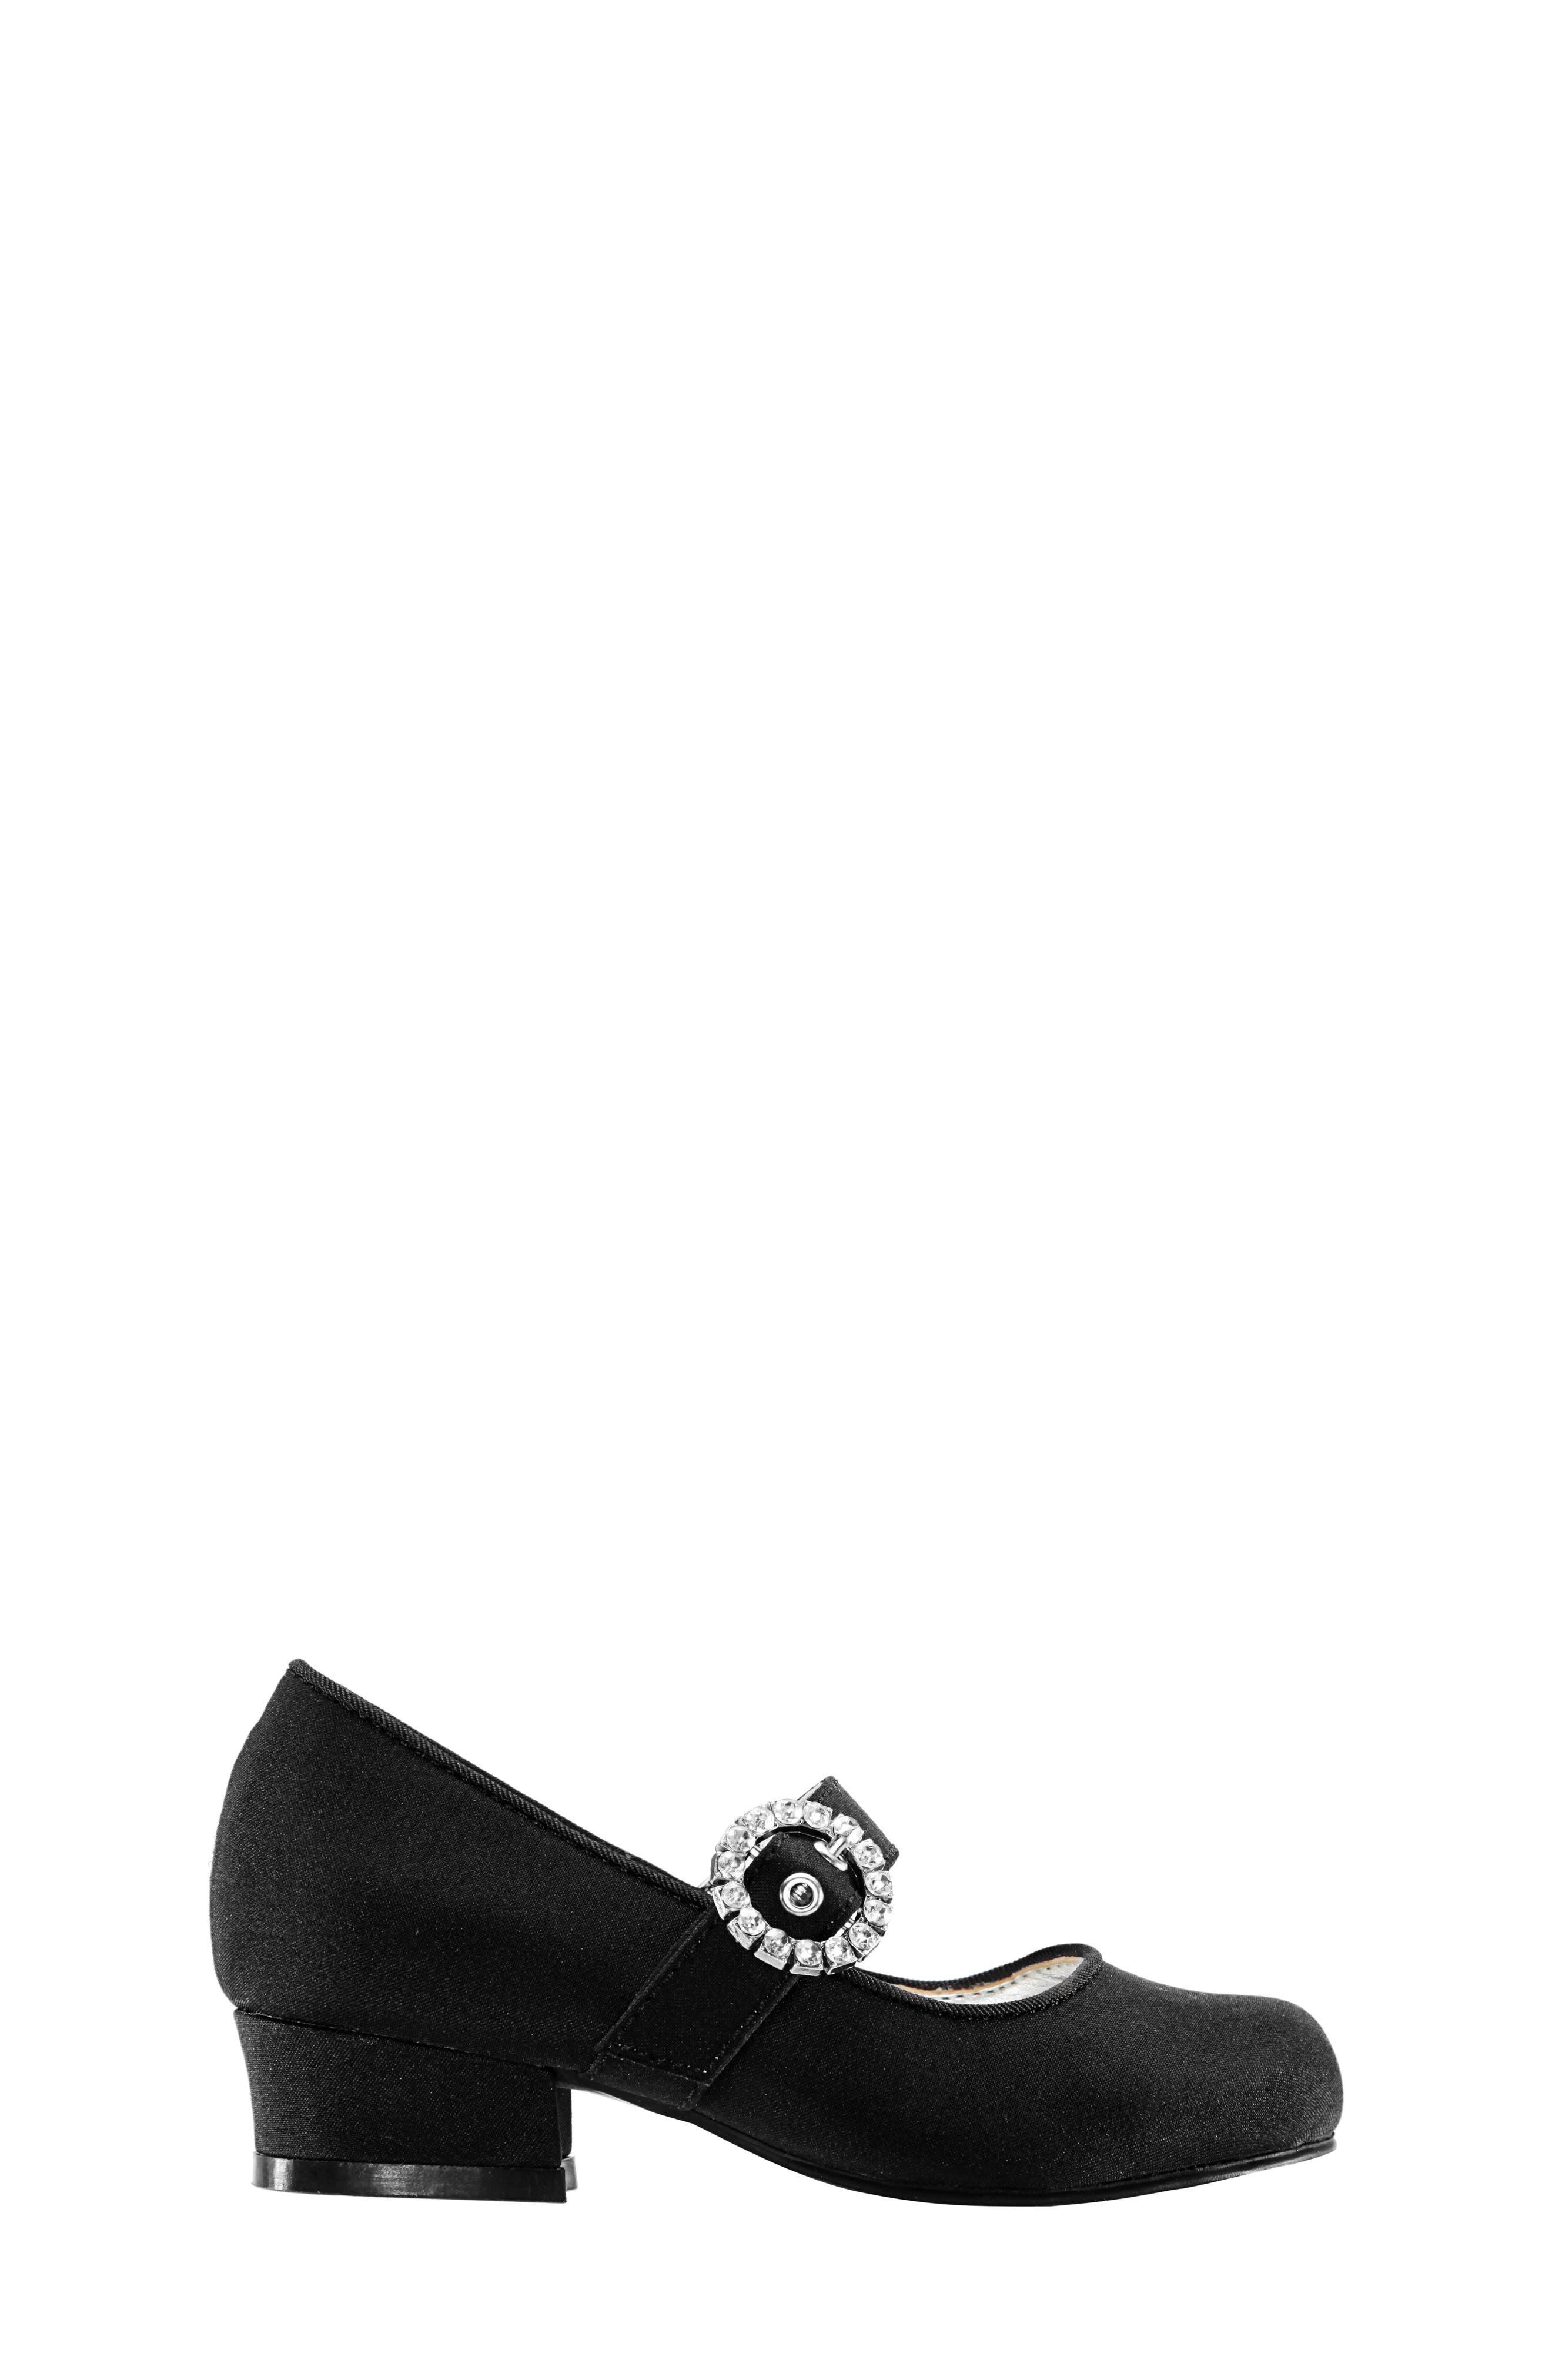 Dulce Block Heel Mary Jane,                             Alternate thumbnail 3, color,                             BLACK LUSTER SATIN